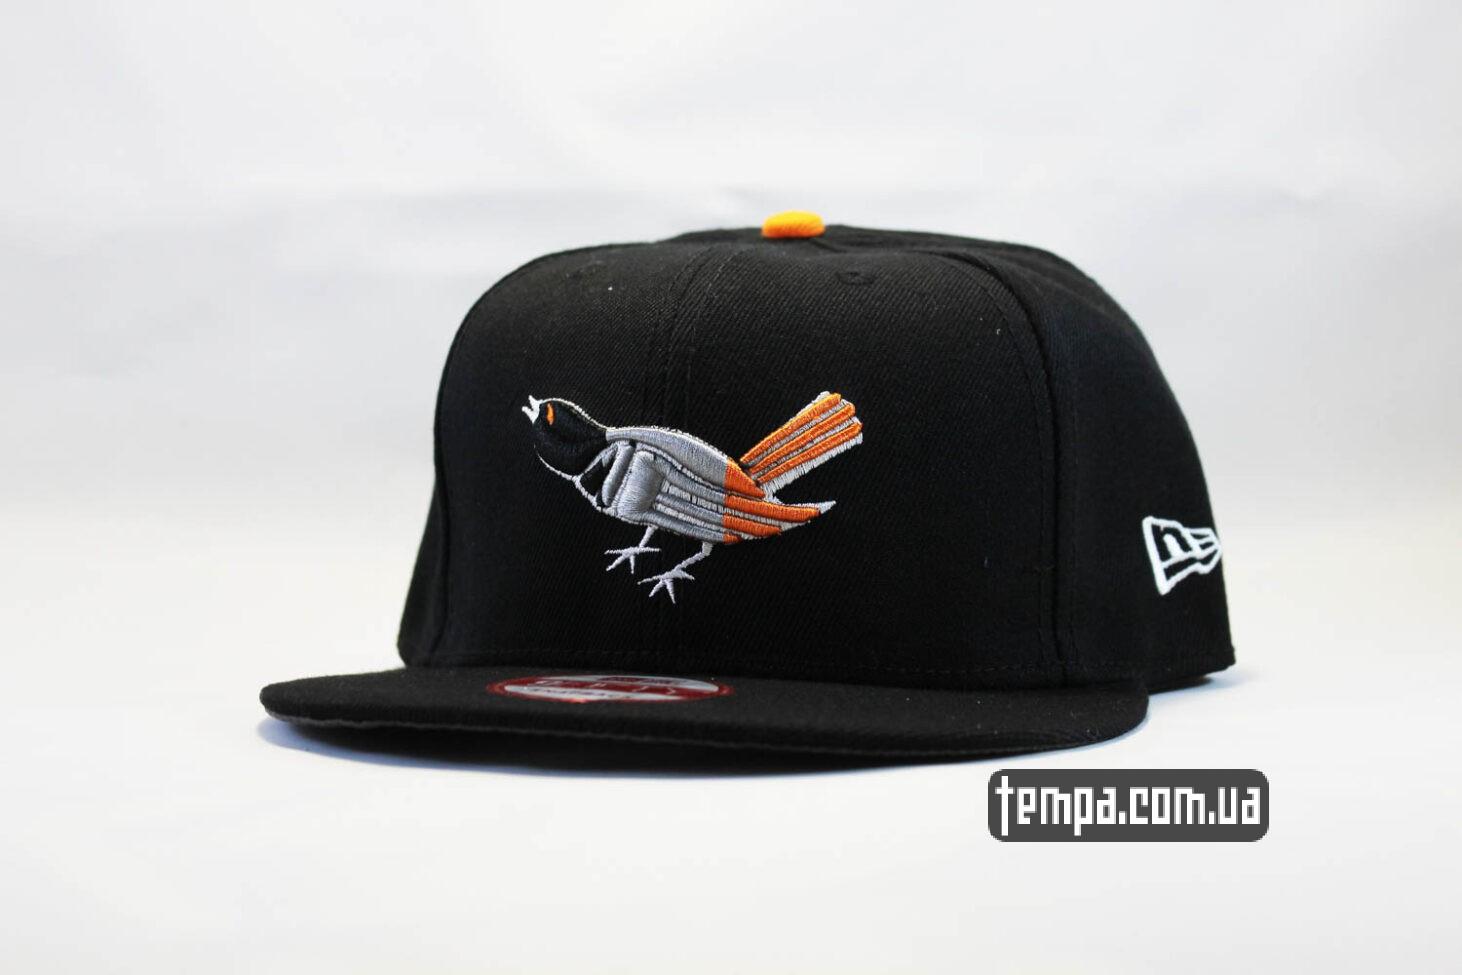 кепка Snapback NewEra pigeon с голубем 9fifty